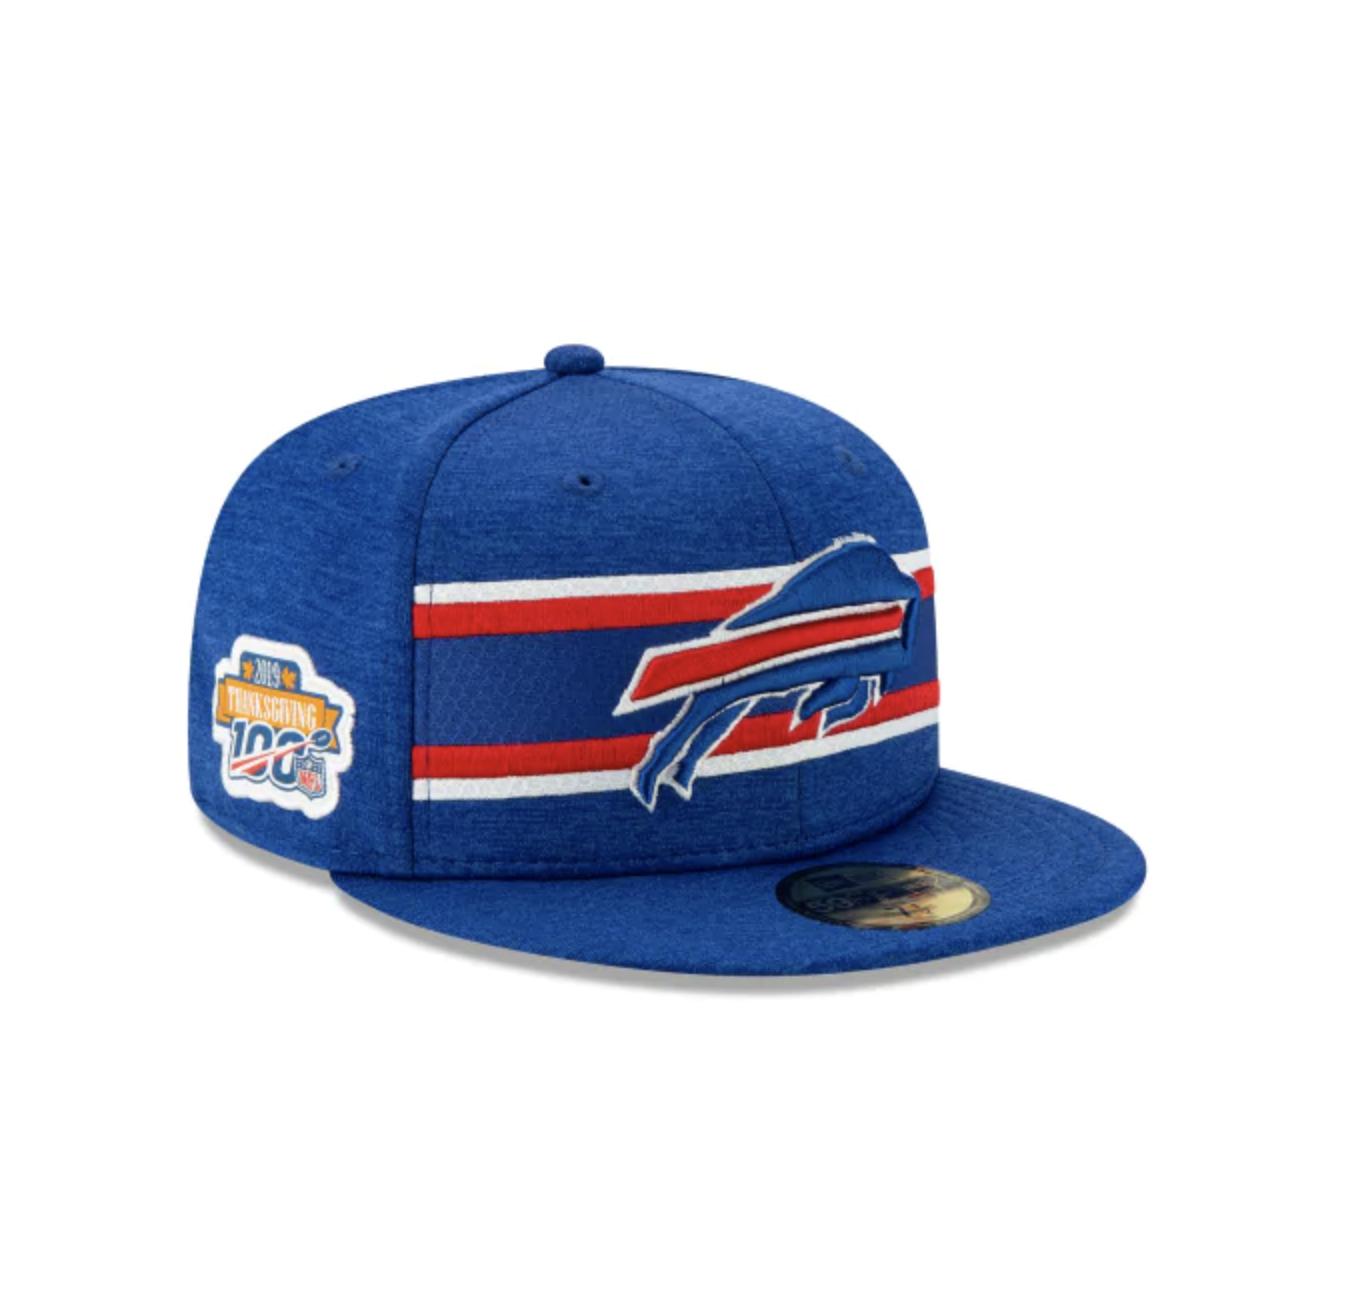 NEW Era-NFL BUFFALO BILLS AUTHENTIC on-field 59 Fifty Cap-Blue